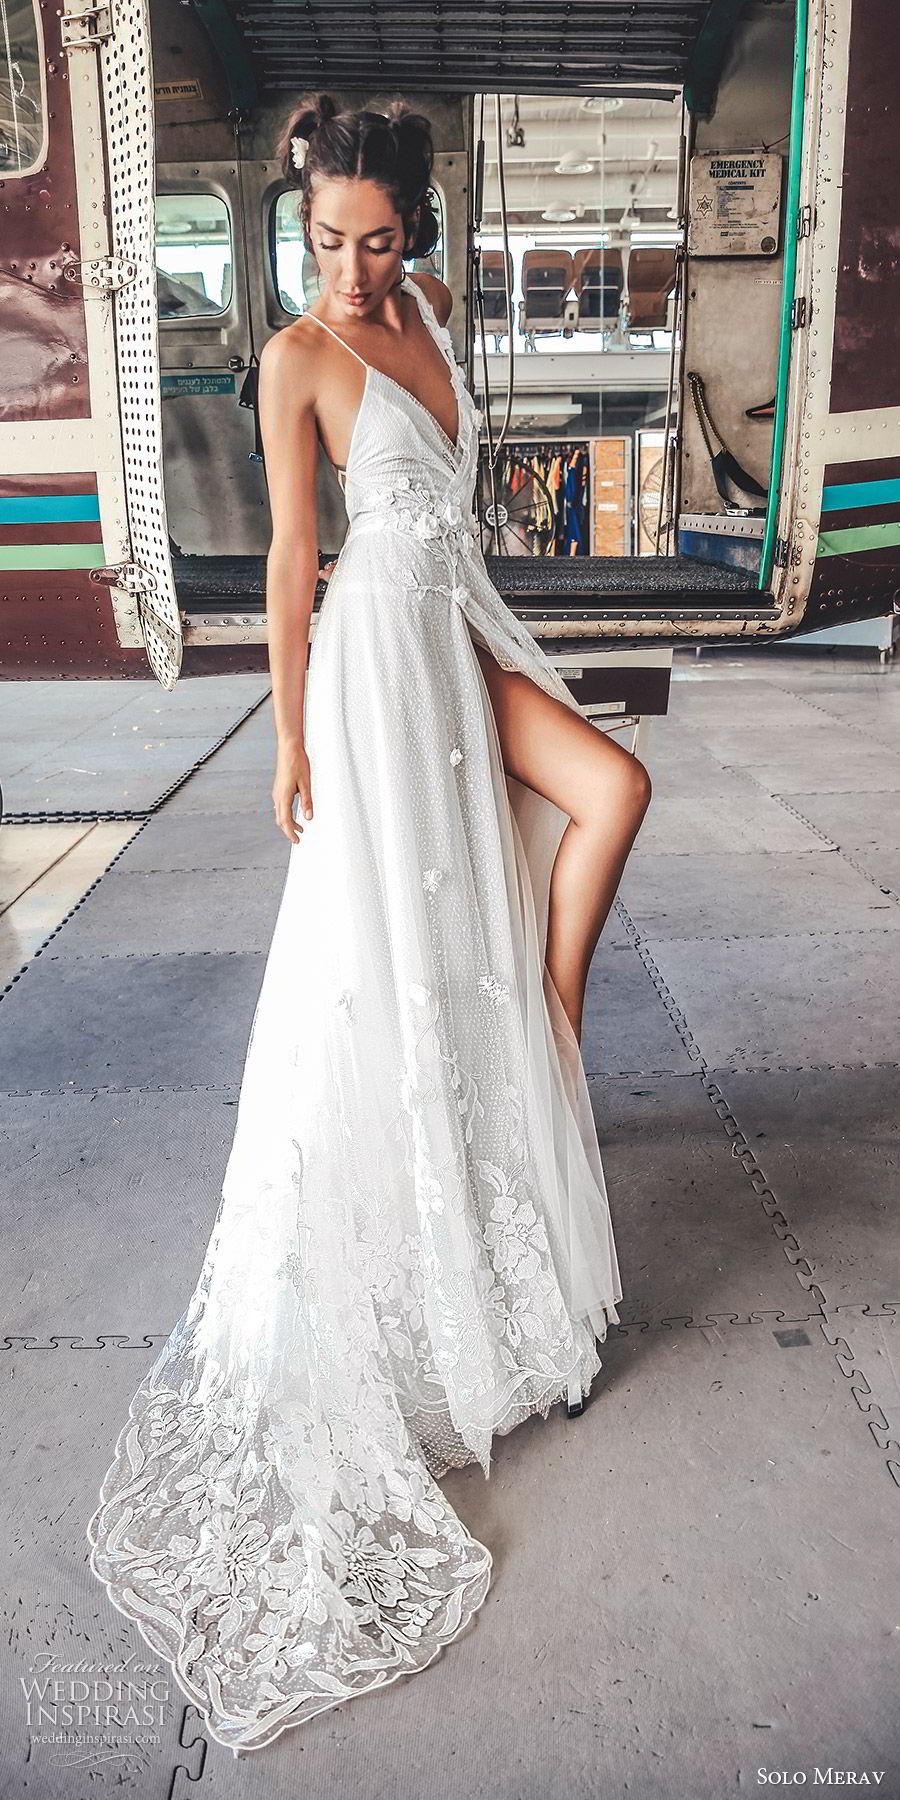 solo merav 2019 bridal sleeveless embellished straps sweetheart neckline surplice bodice a line ball gown wedding dress (6) bv slit skirt sweep train romantic